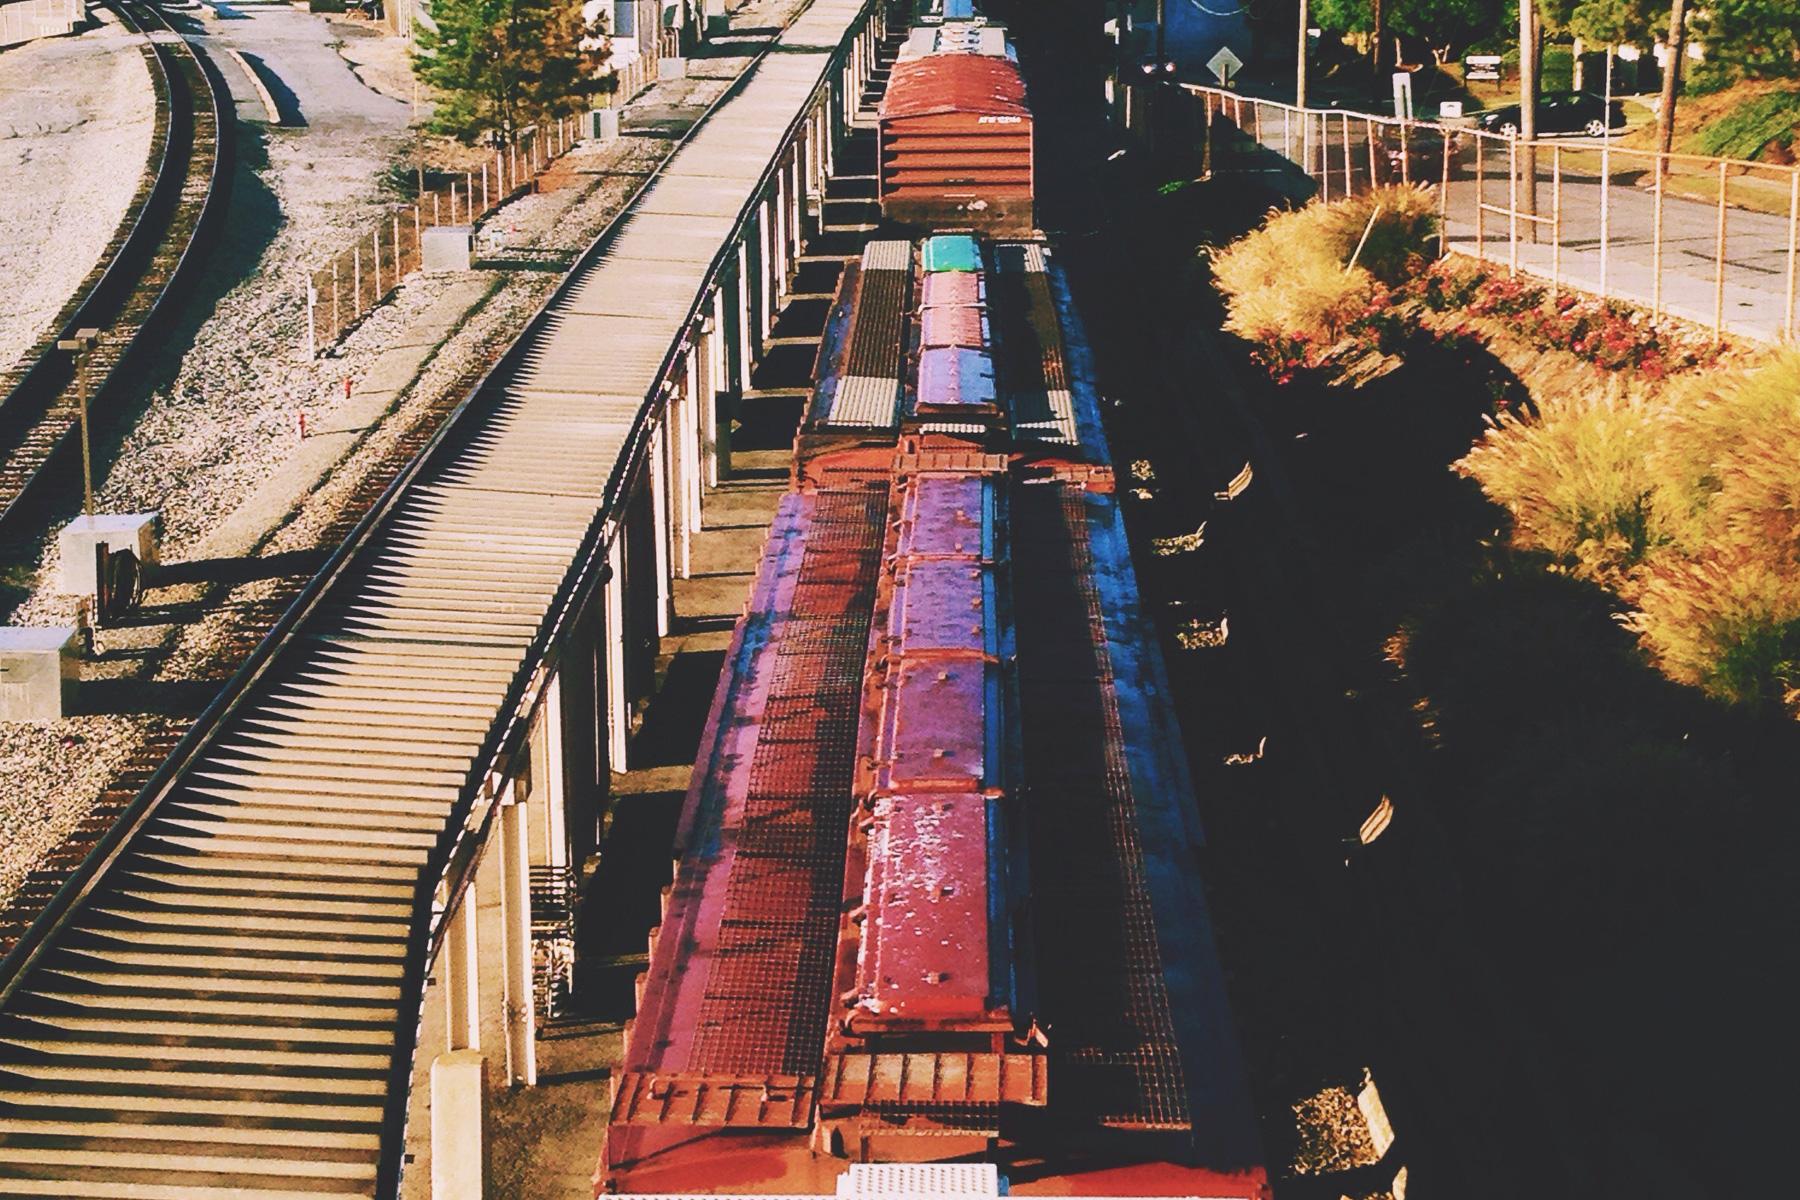 Long train going through city